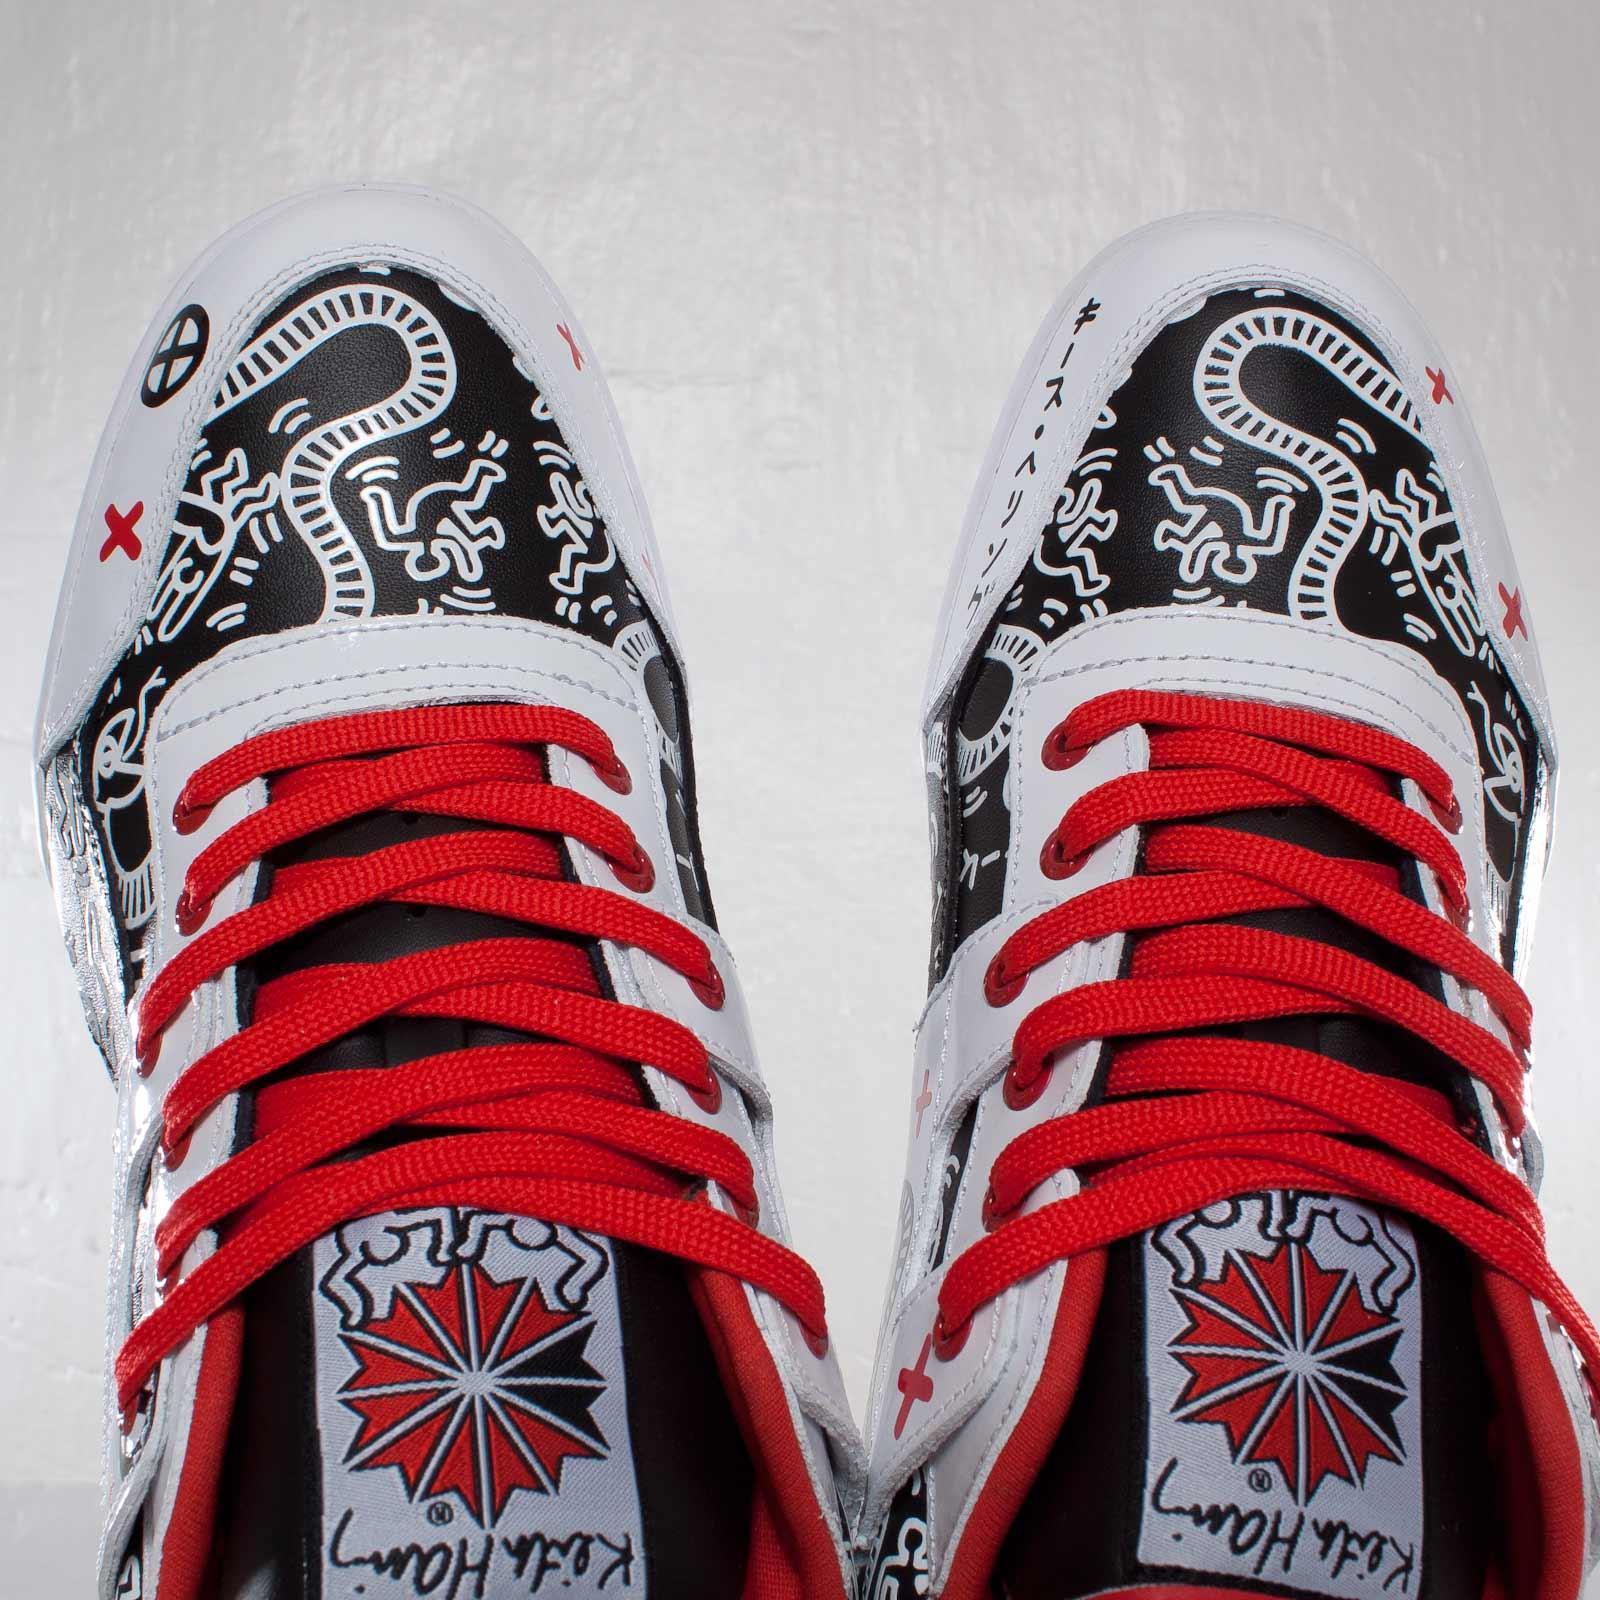 6acec135cdc7d Reebok Workout Plus R12 - V44590 - Sneakersnstuff